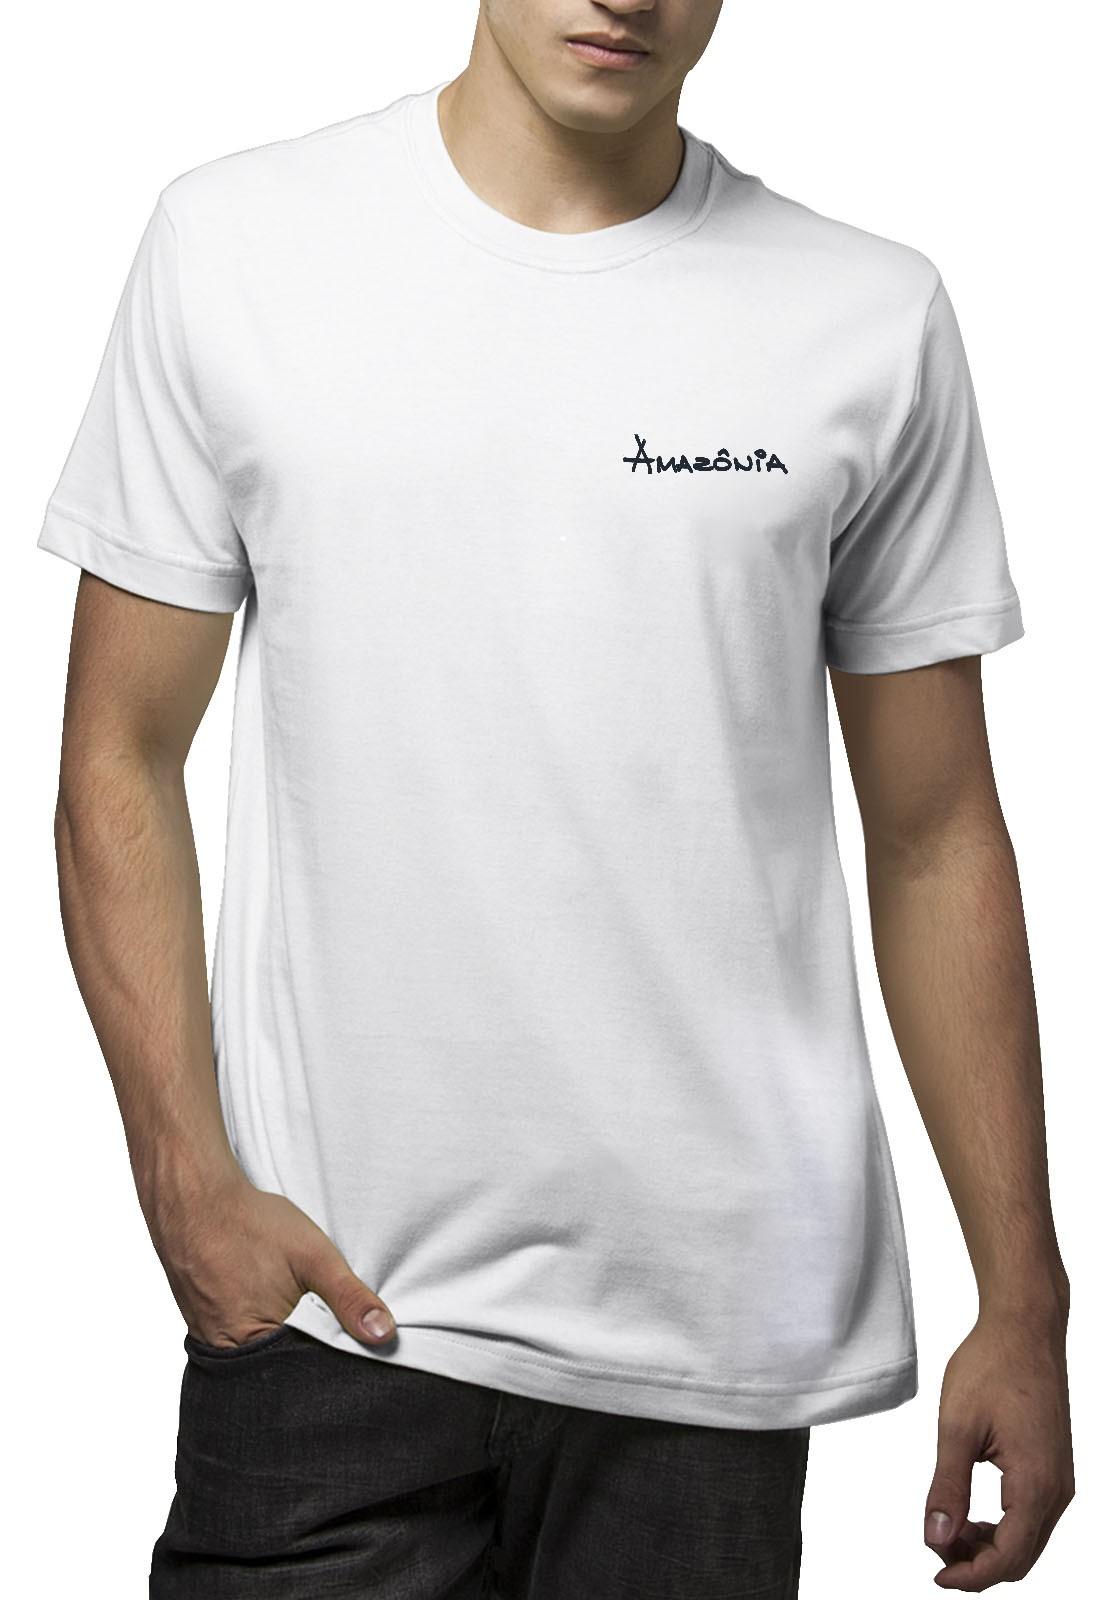 Camiseta Amazônia Tucano Colorido - Branco